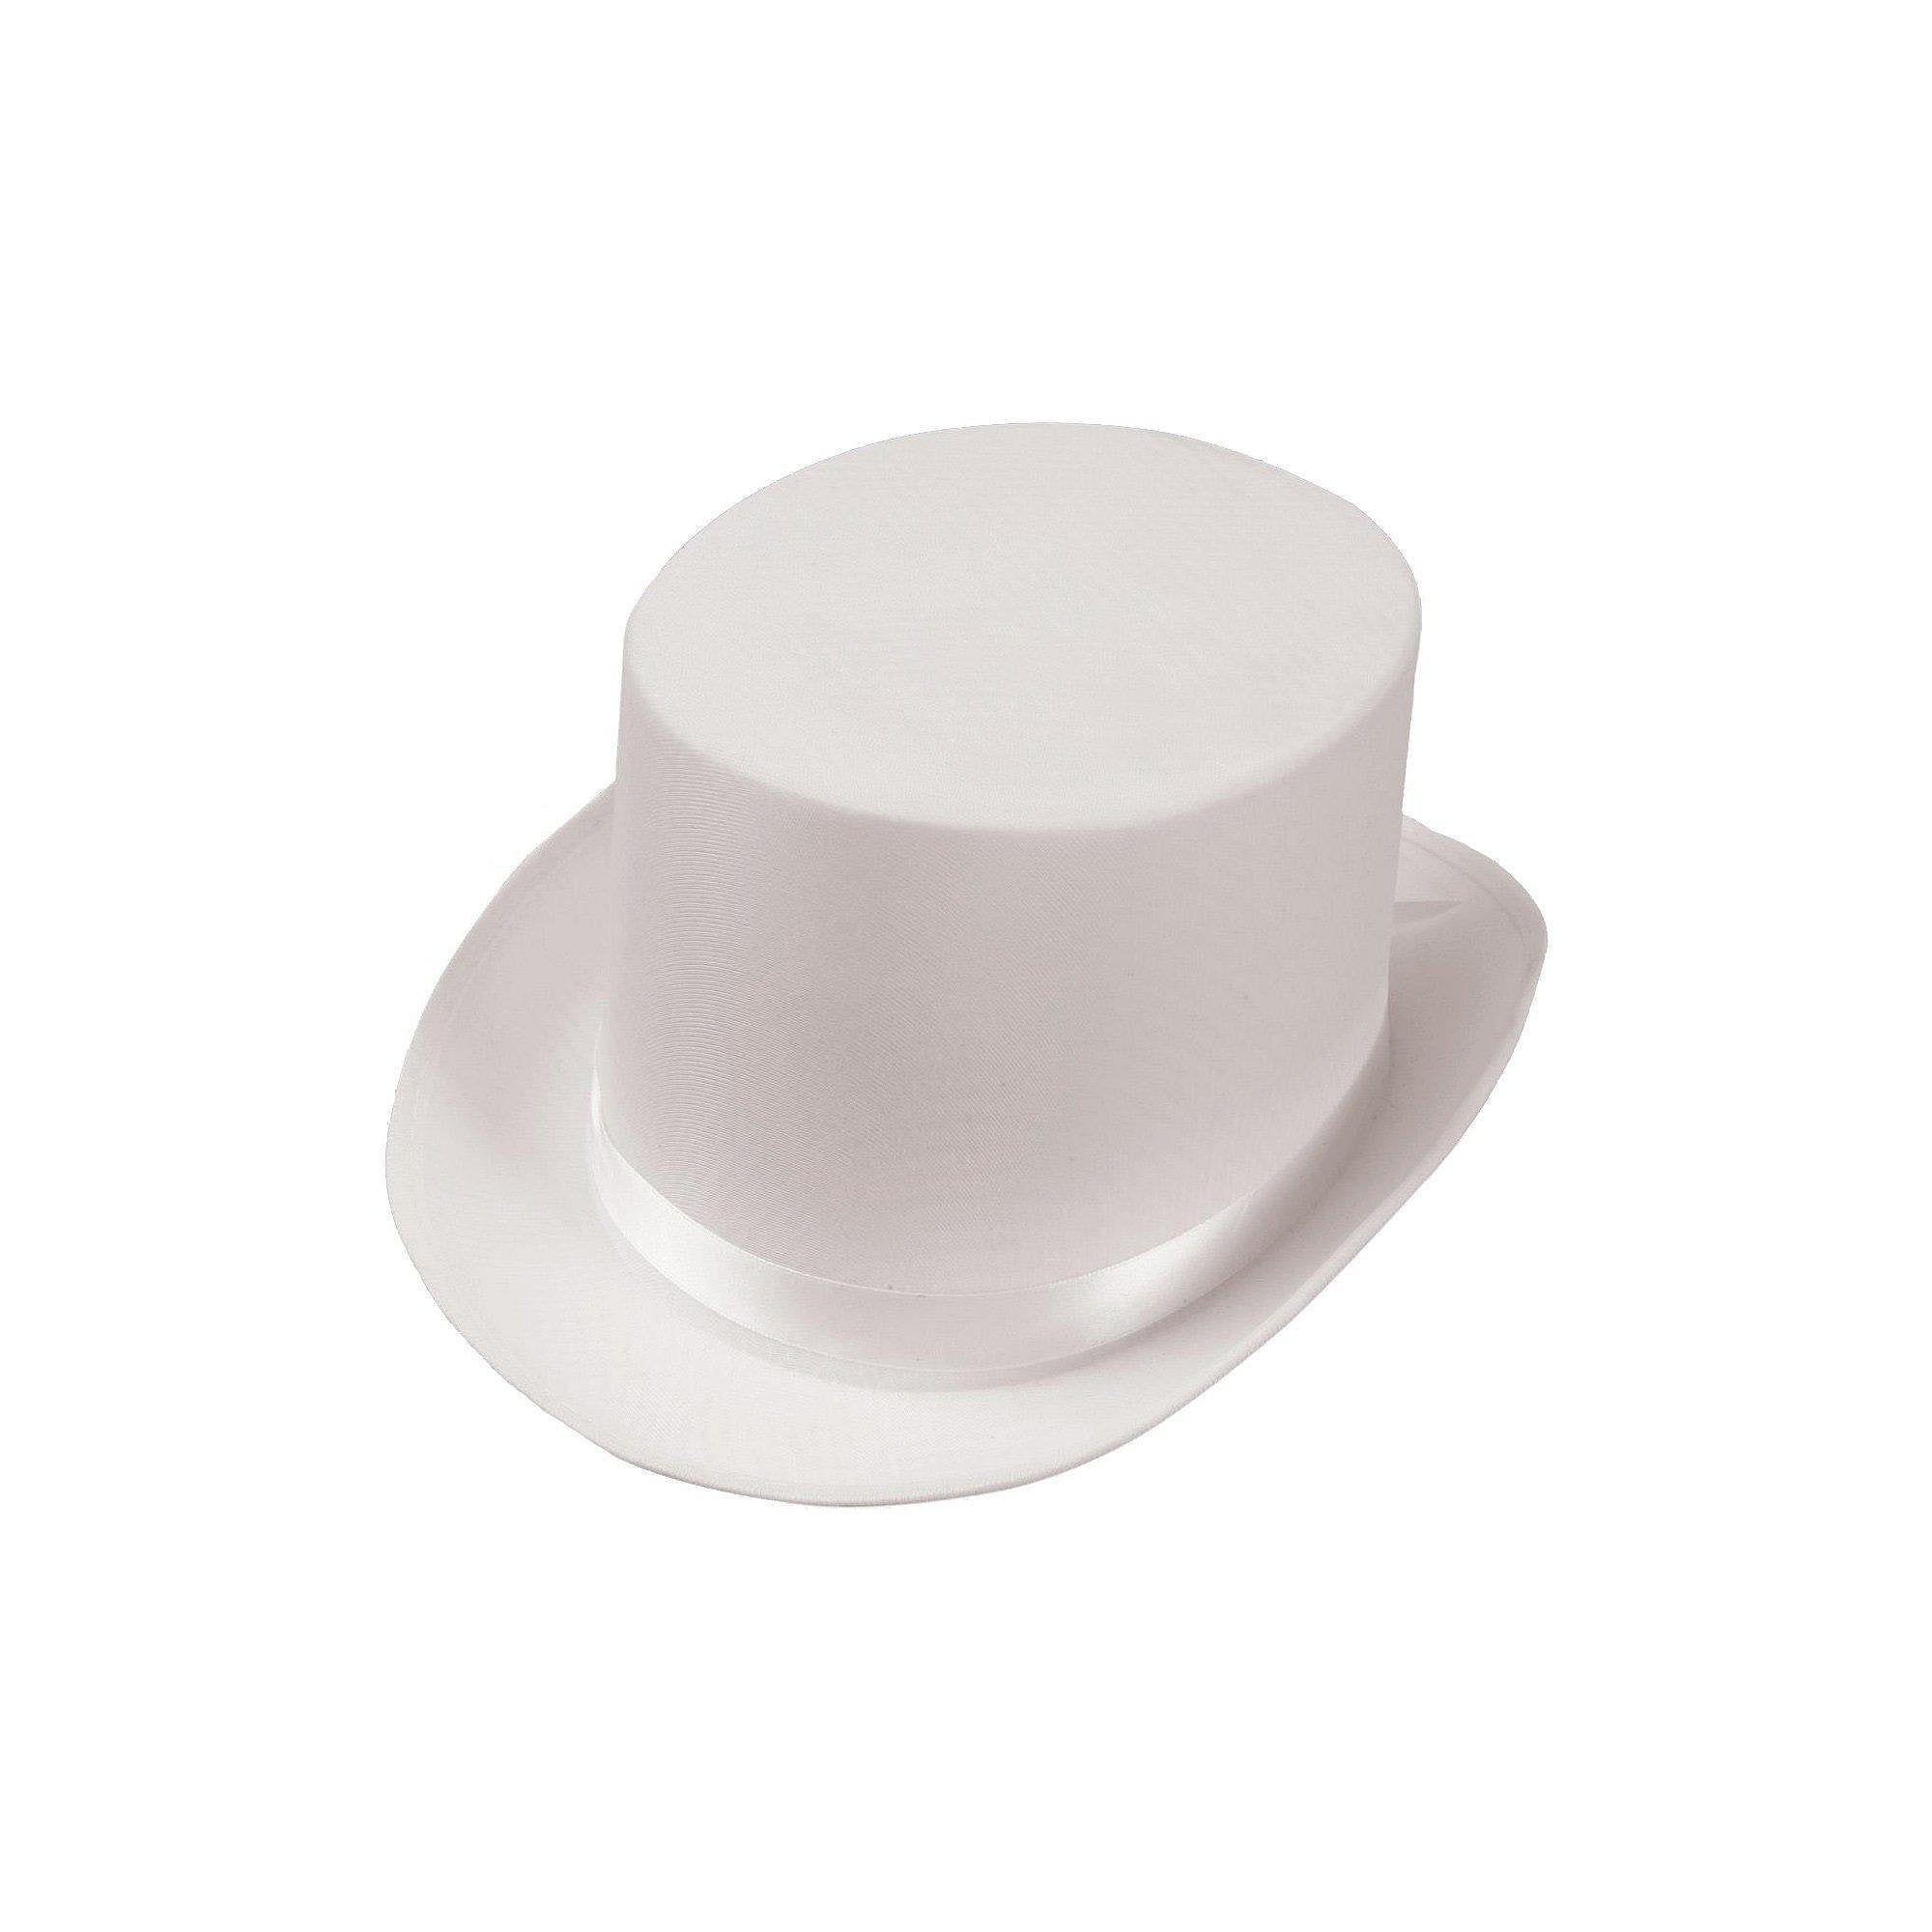 Top Hat White 7